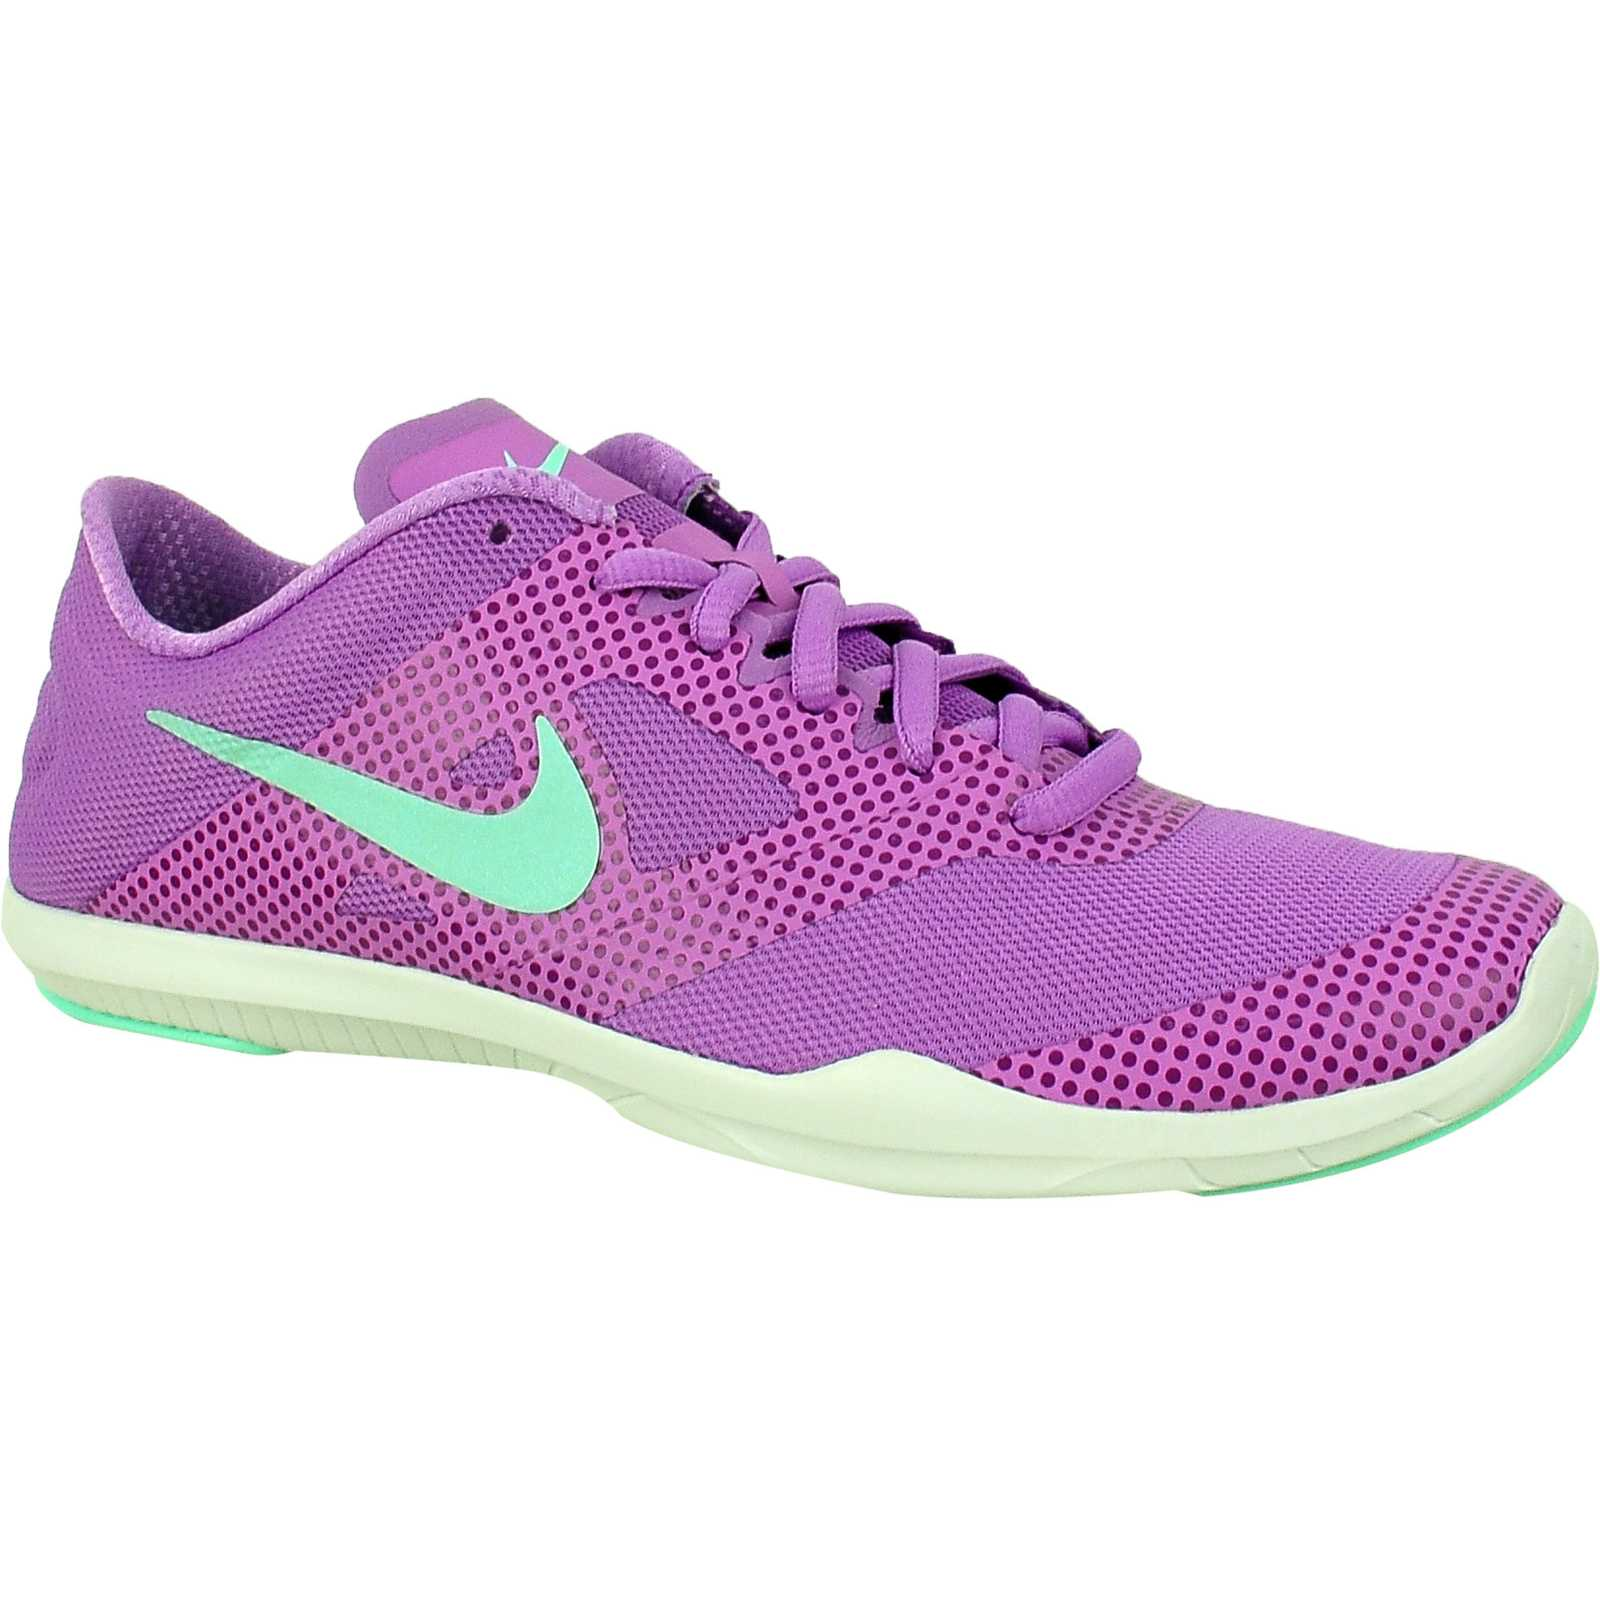 Pantofi sport femei Nike Studio Trainer 2 Print 684894-502